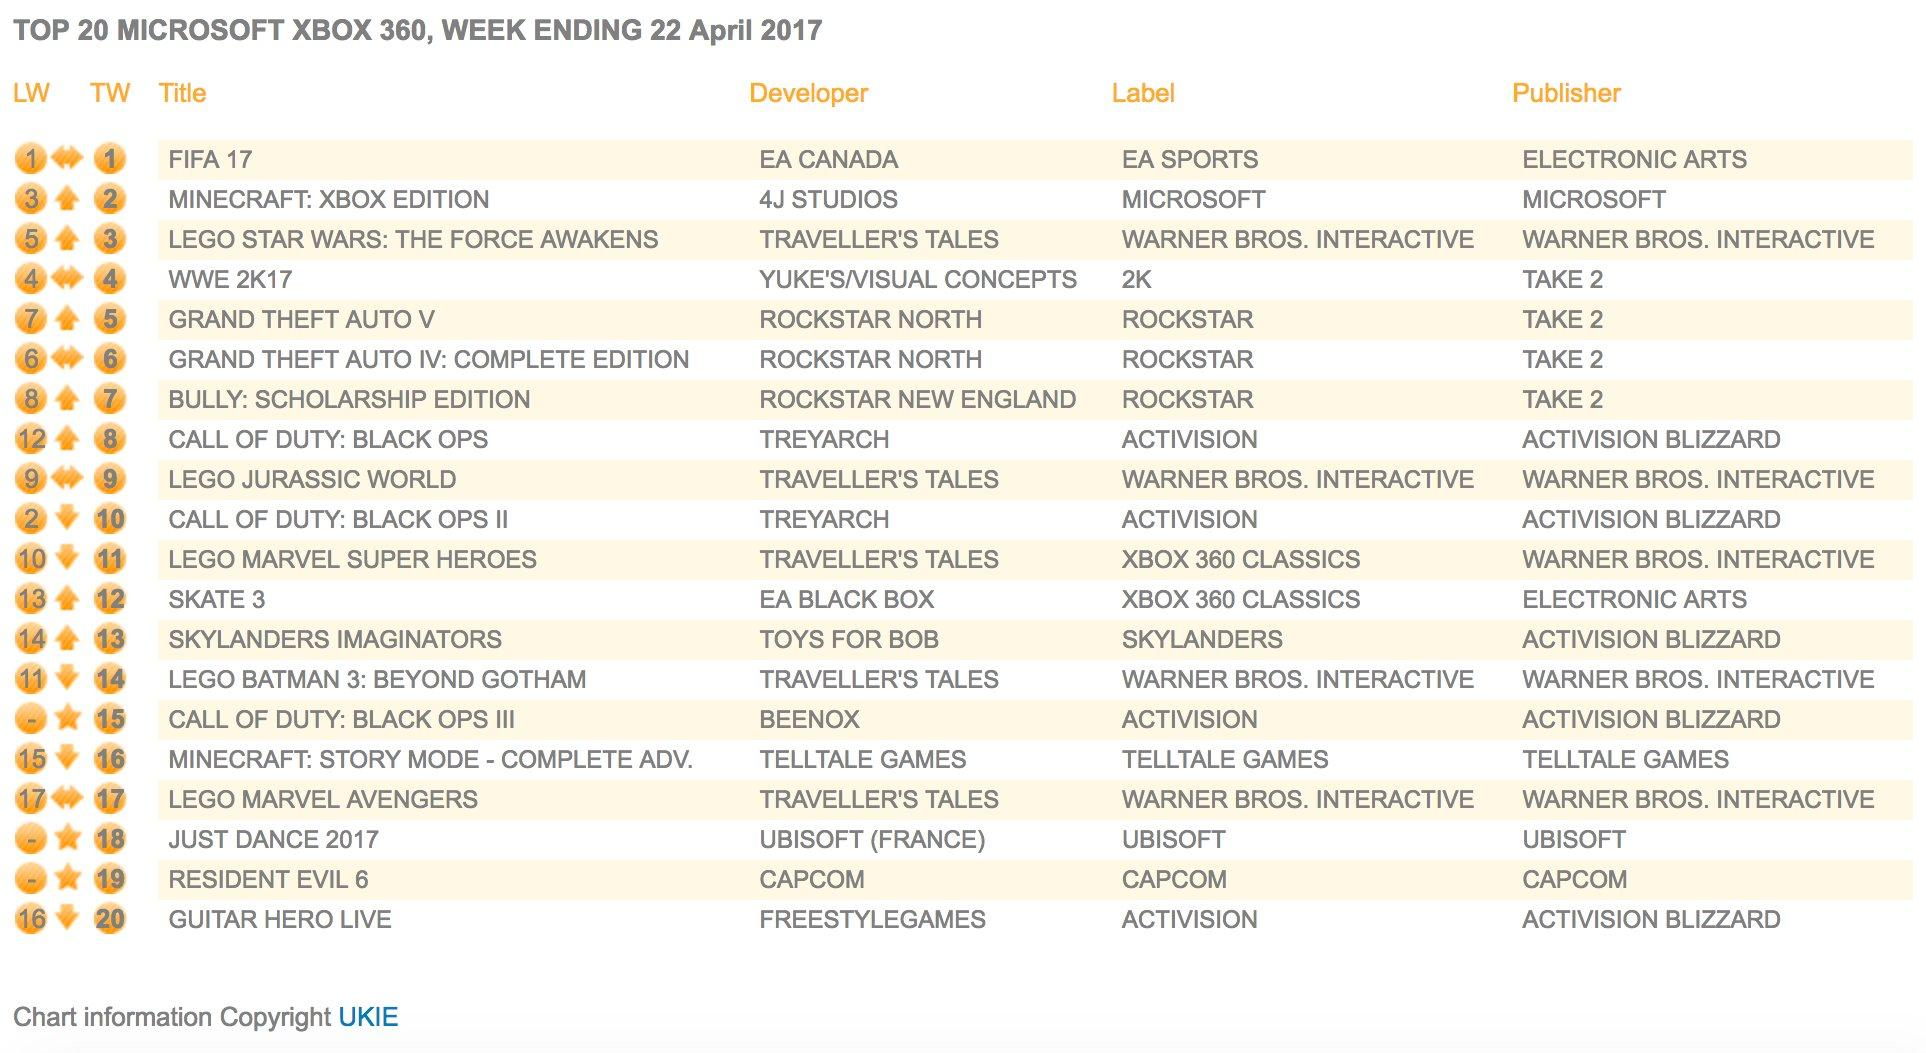 April22-Xbox360-charts.jpg